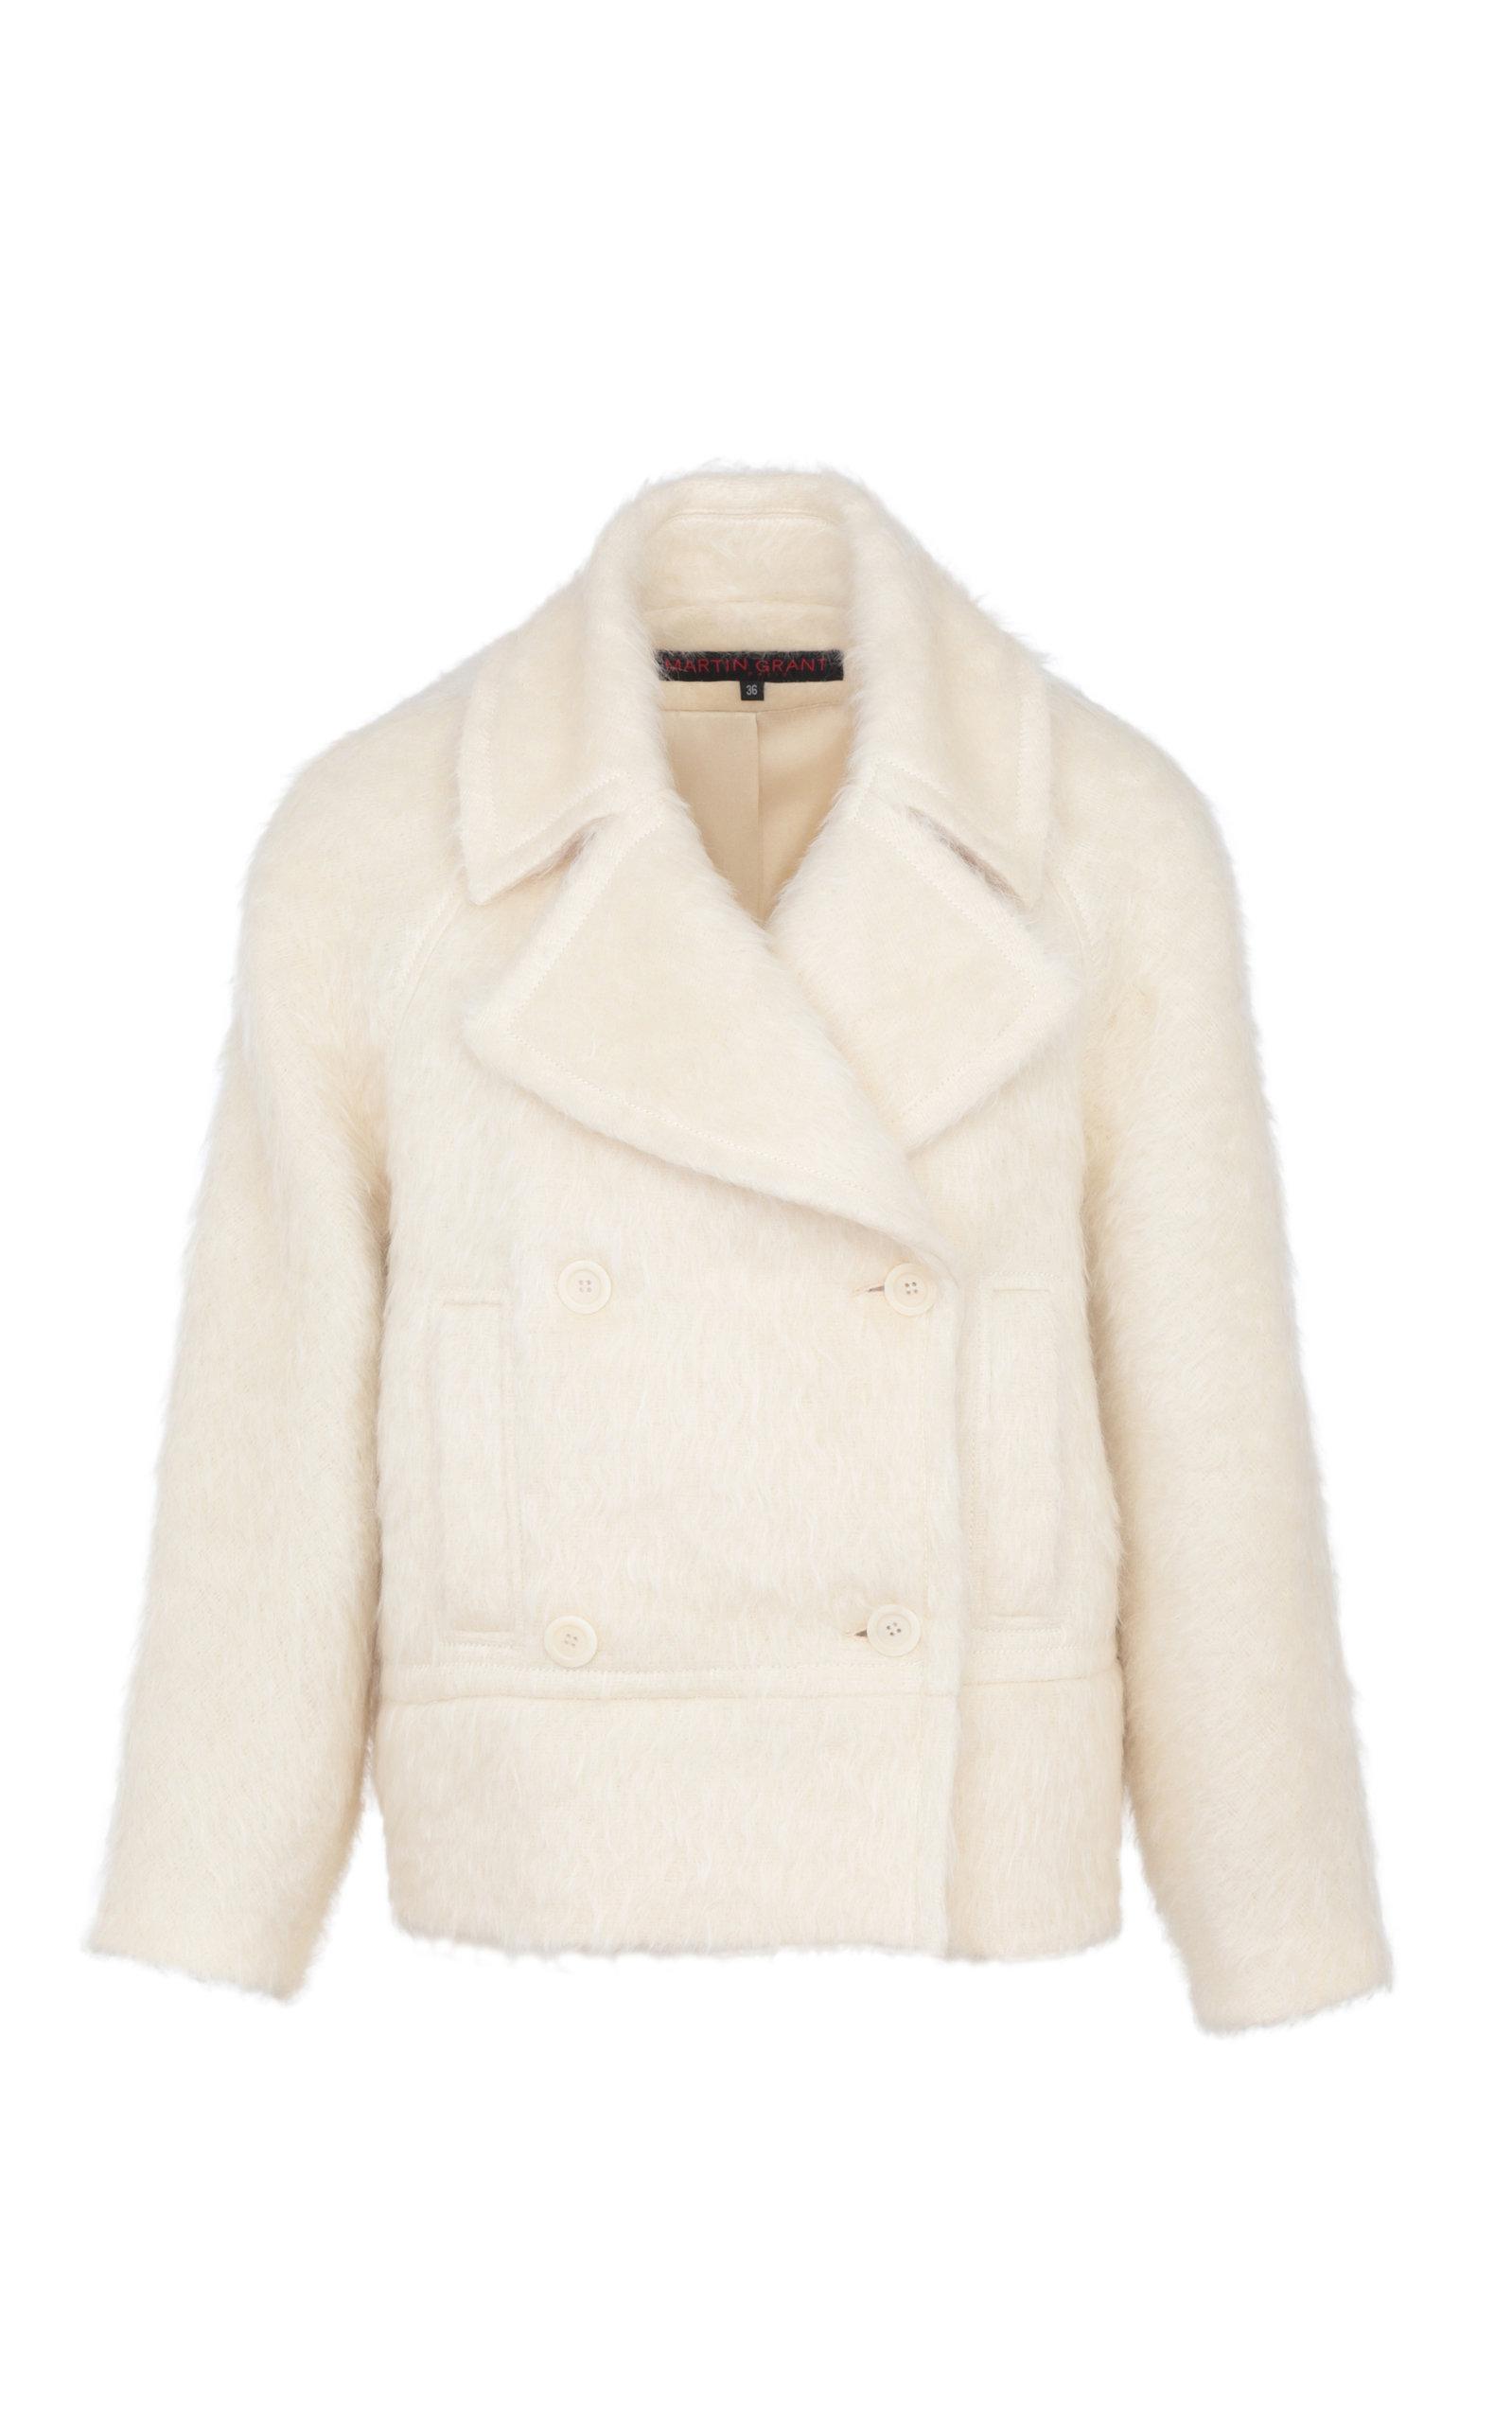 Women's Brushed Mohair-Blend Pea Coat